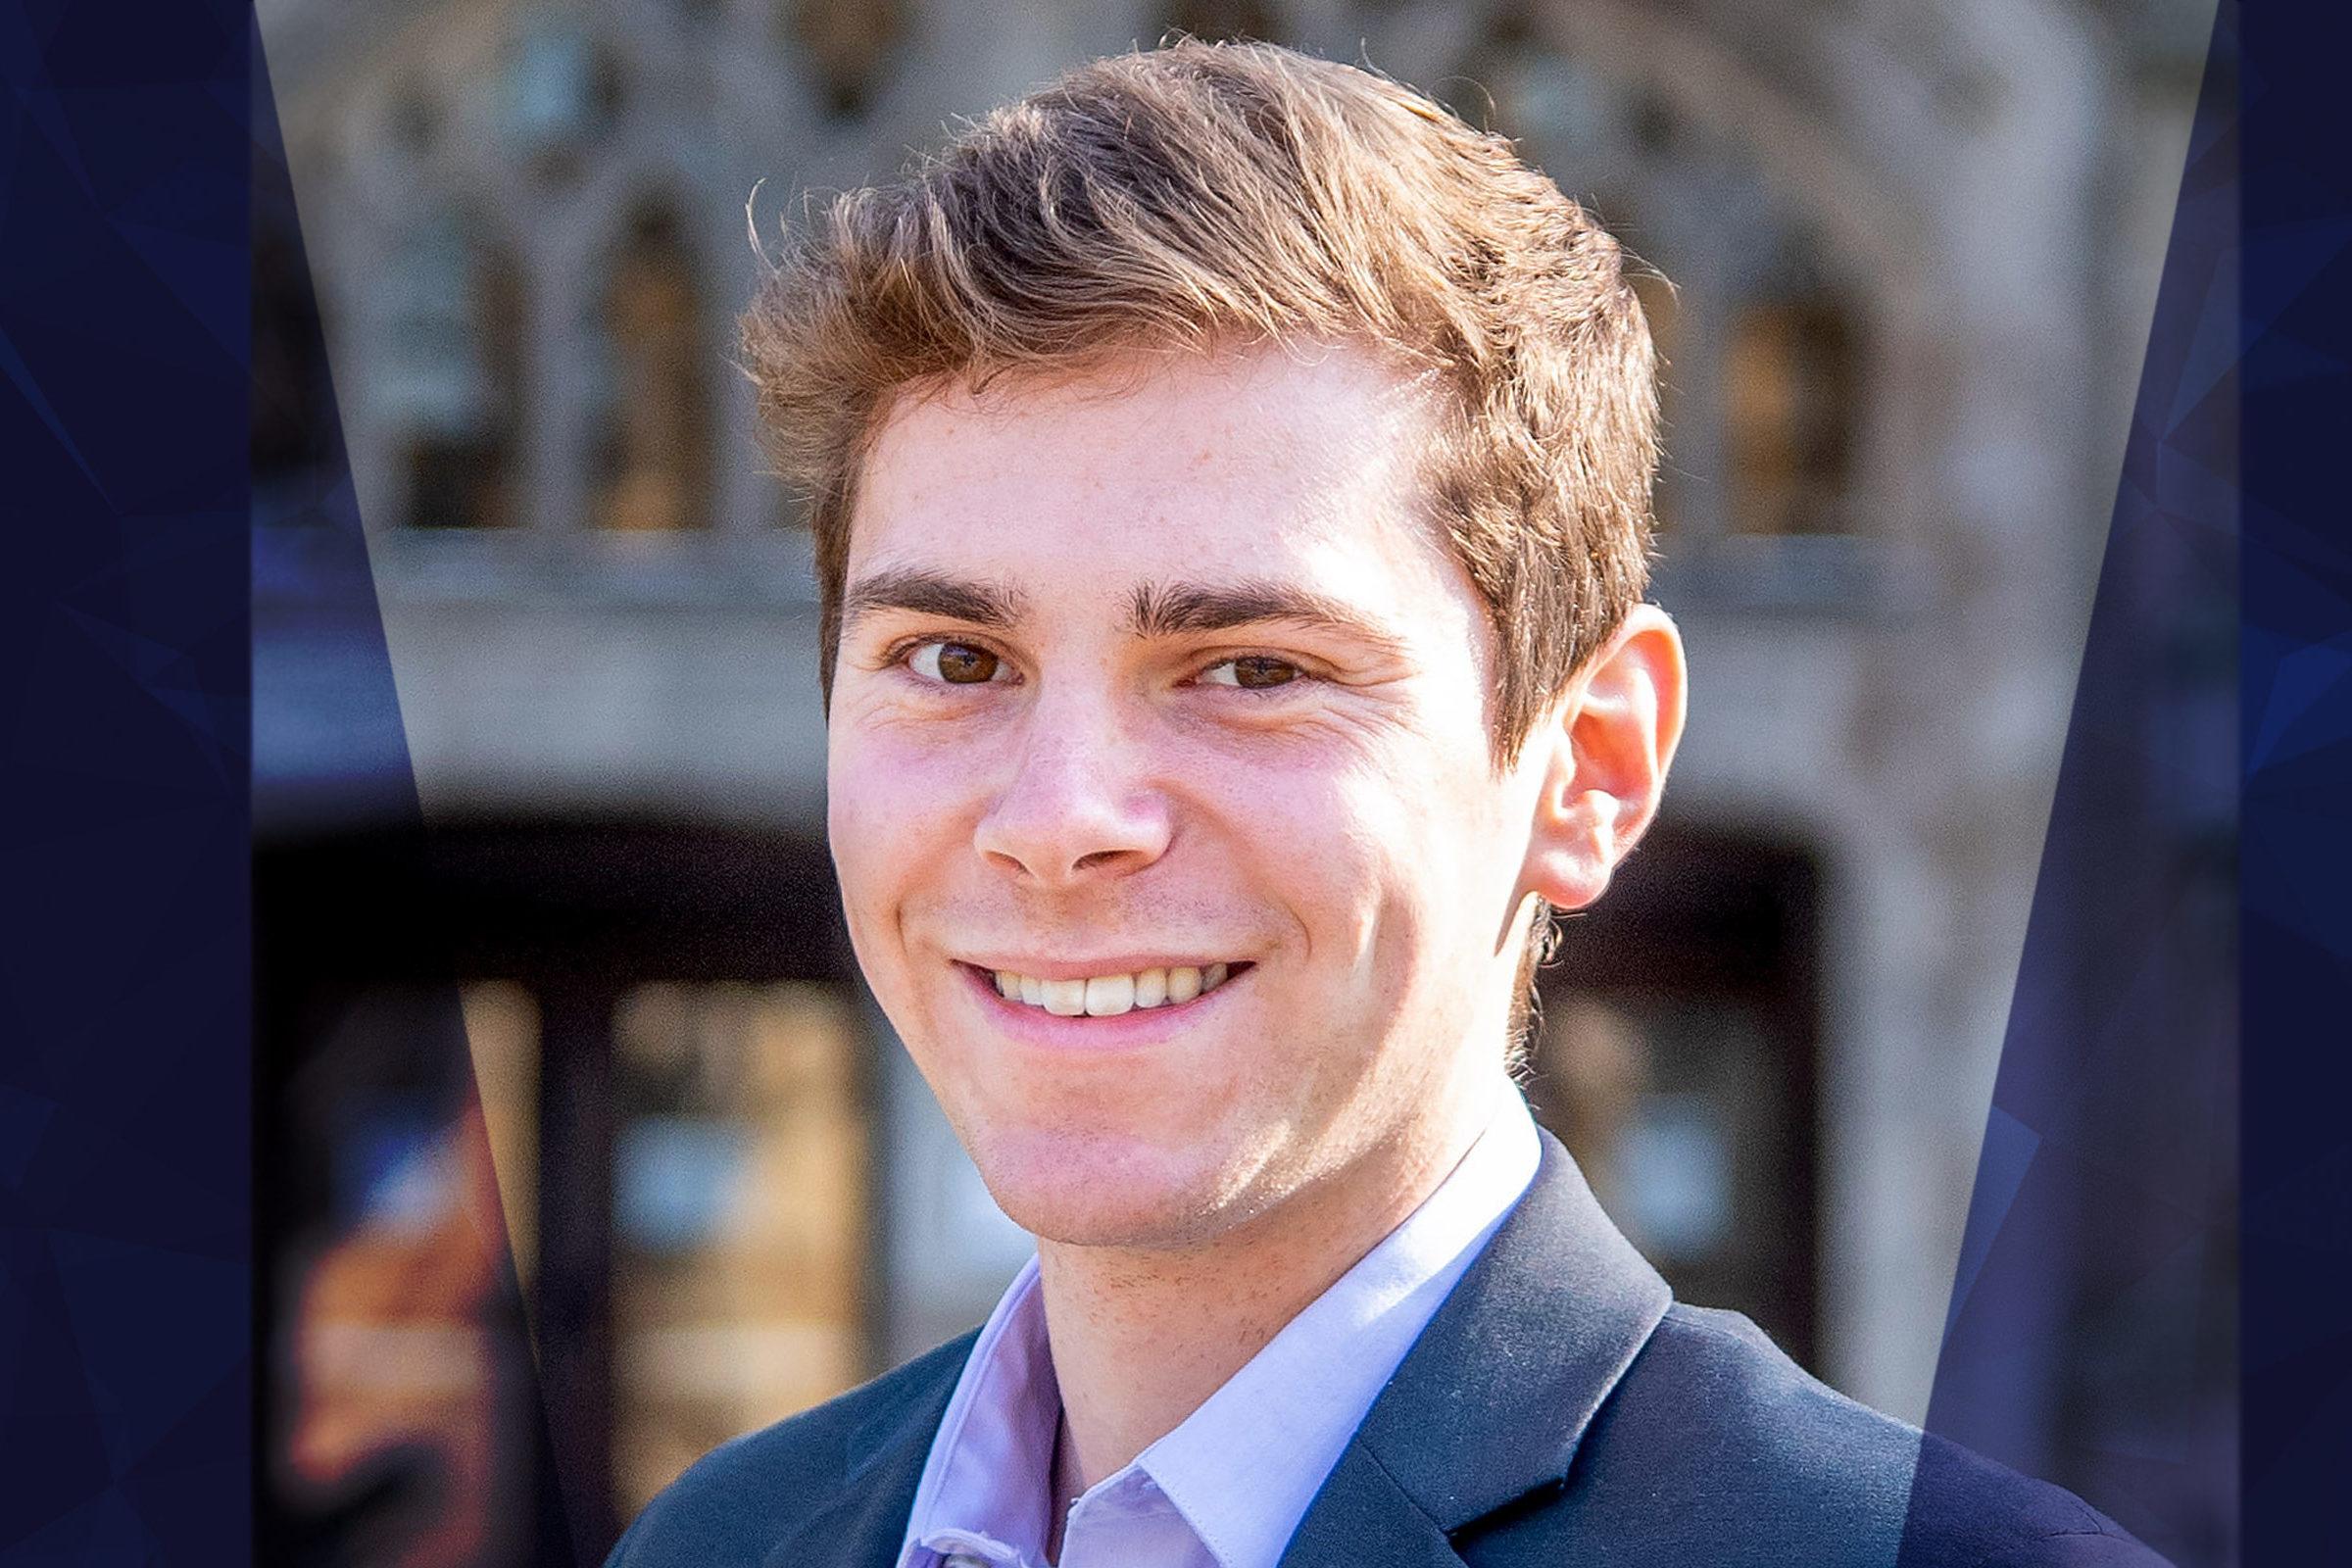 U-M Aerospace first-year PhD student, Eytan Adler (BSAE '20) awarded 2020-2021 MICDE Fellowship